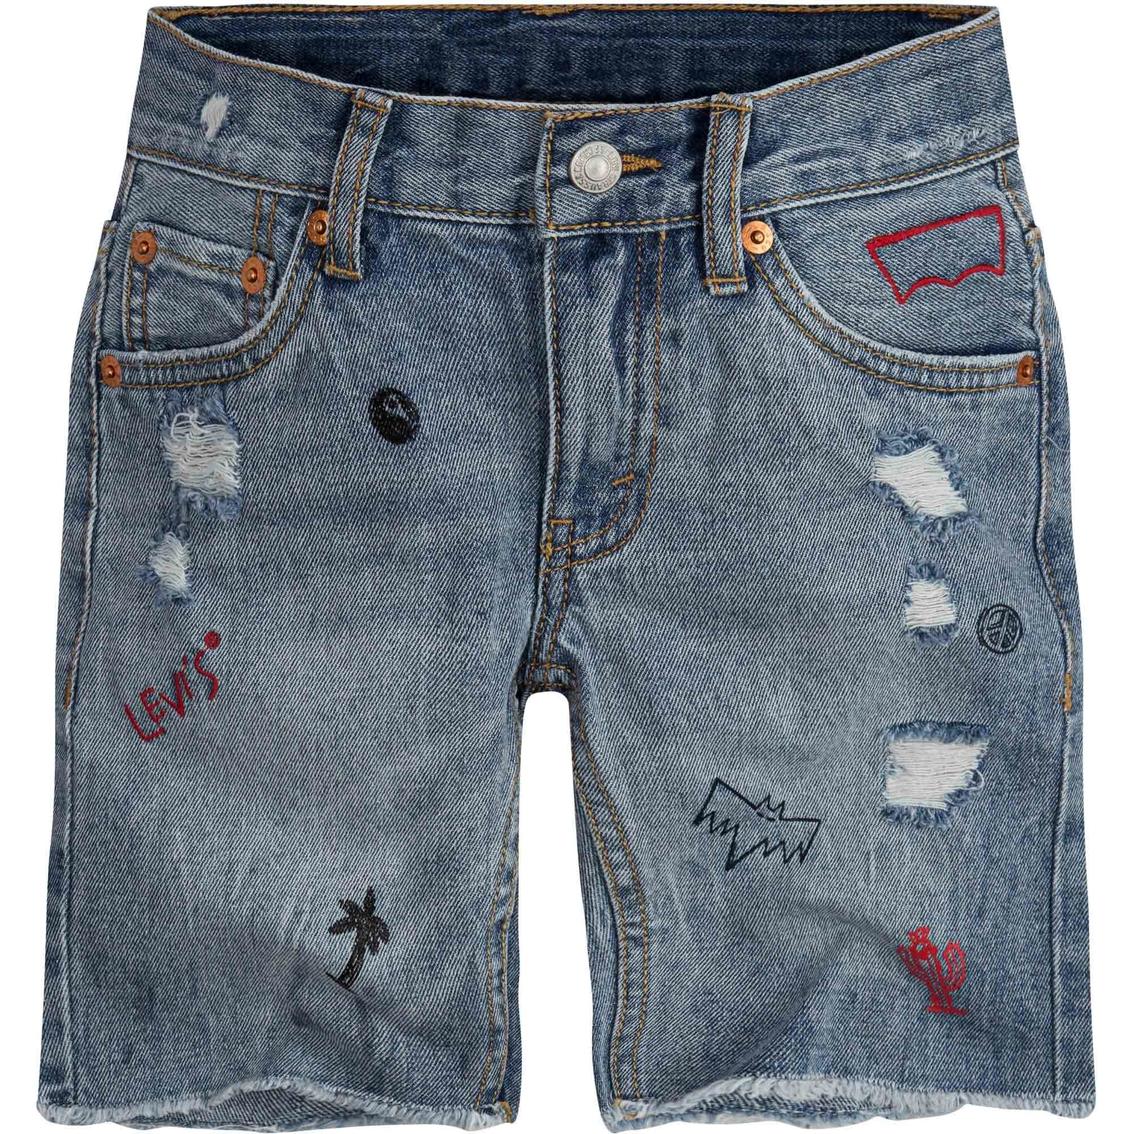 878c0b56 Levi's Little Boys 511 Slim Fit Distressed Cut Off Shorts | Boys 4 ...